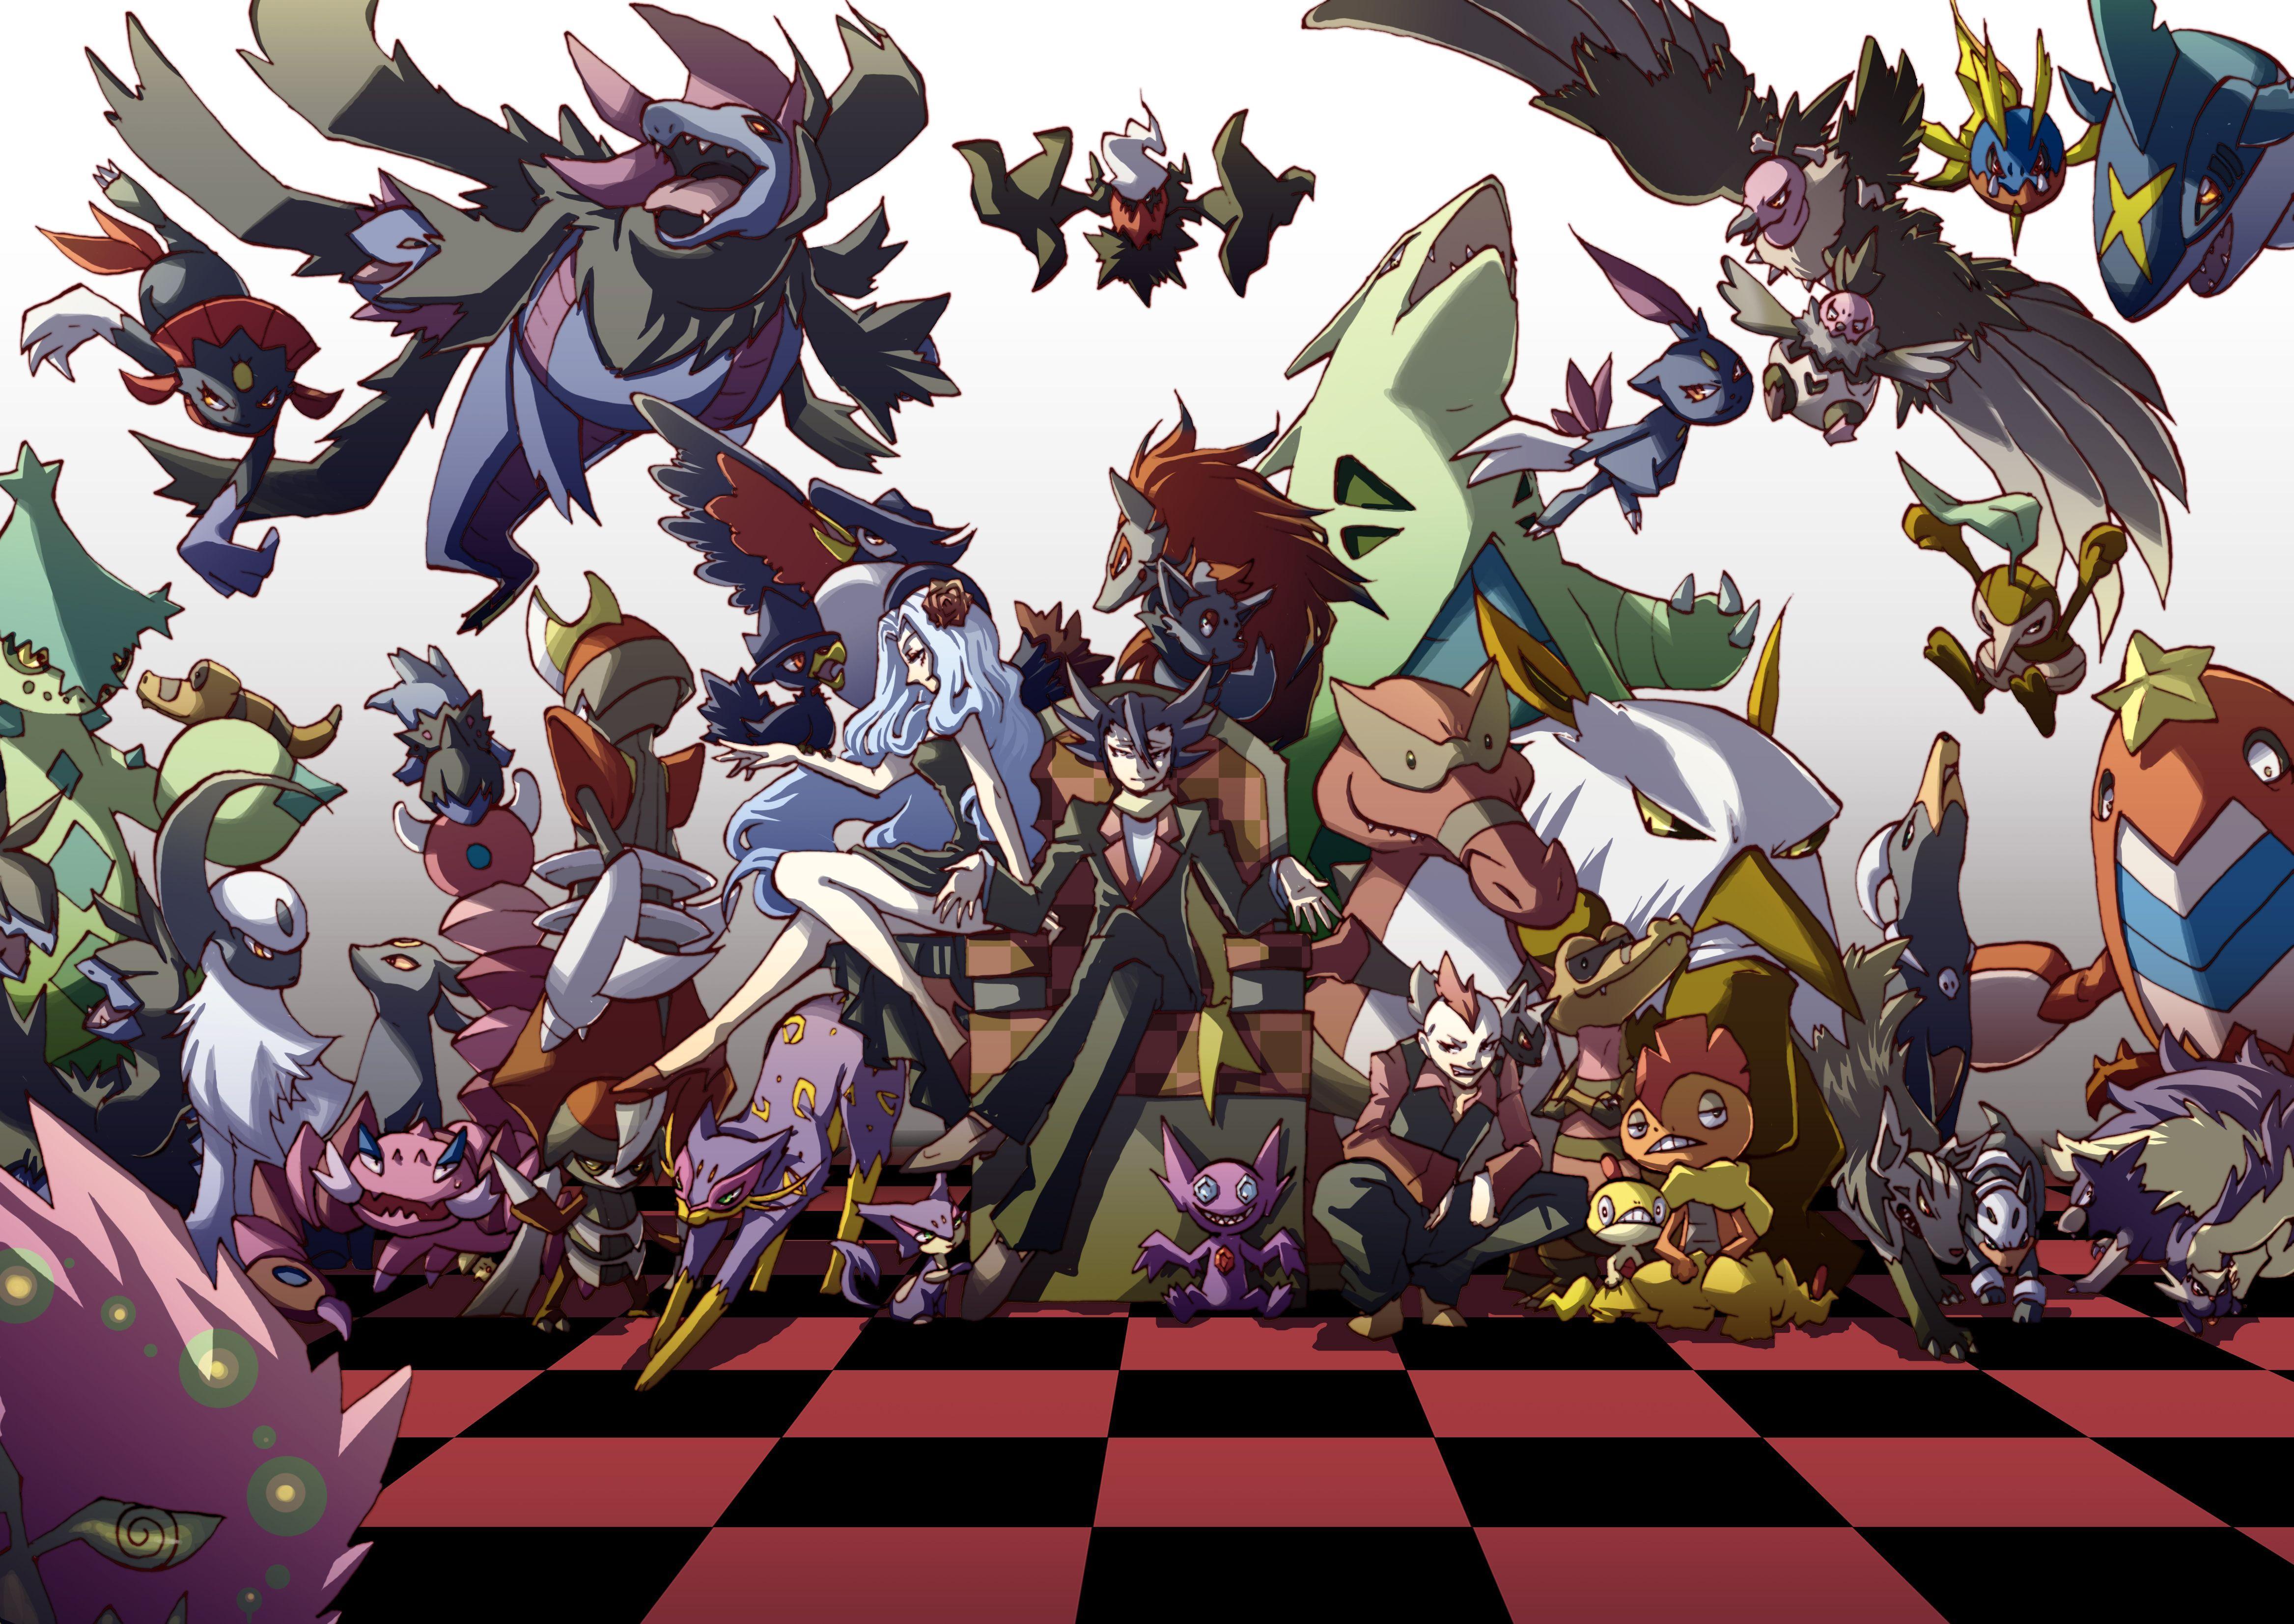 Dark Pokemon Wallpapers Top Free Dark Pokemon Backgrounds Wallpaperaccess